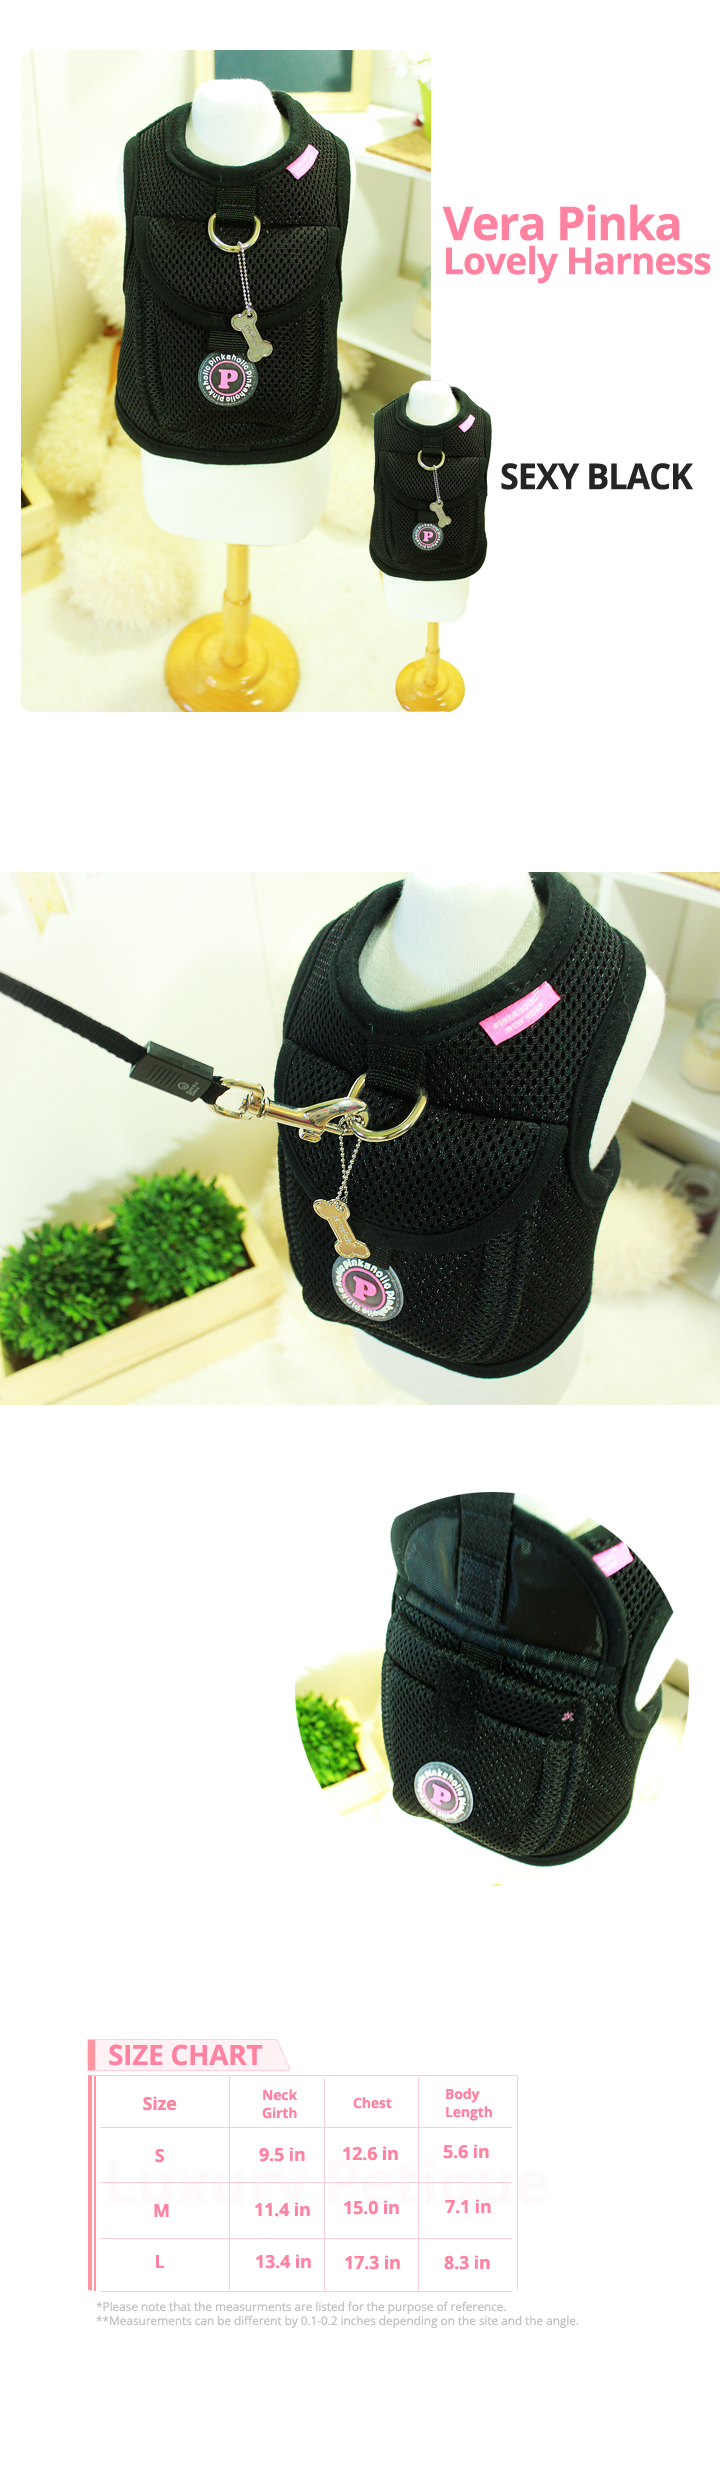 pocket-harness-2.png